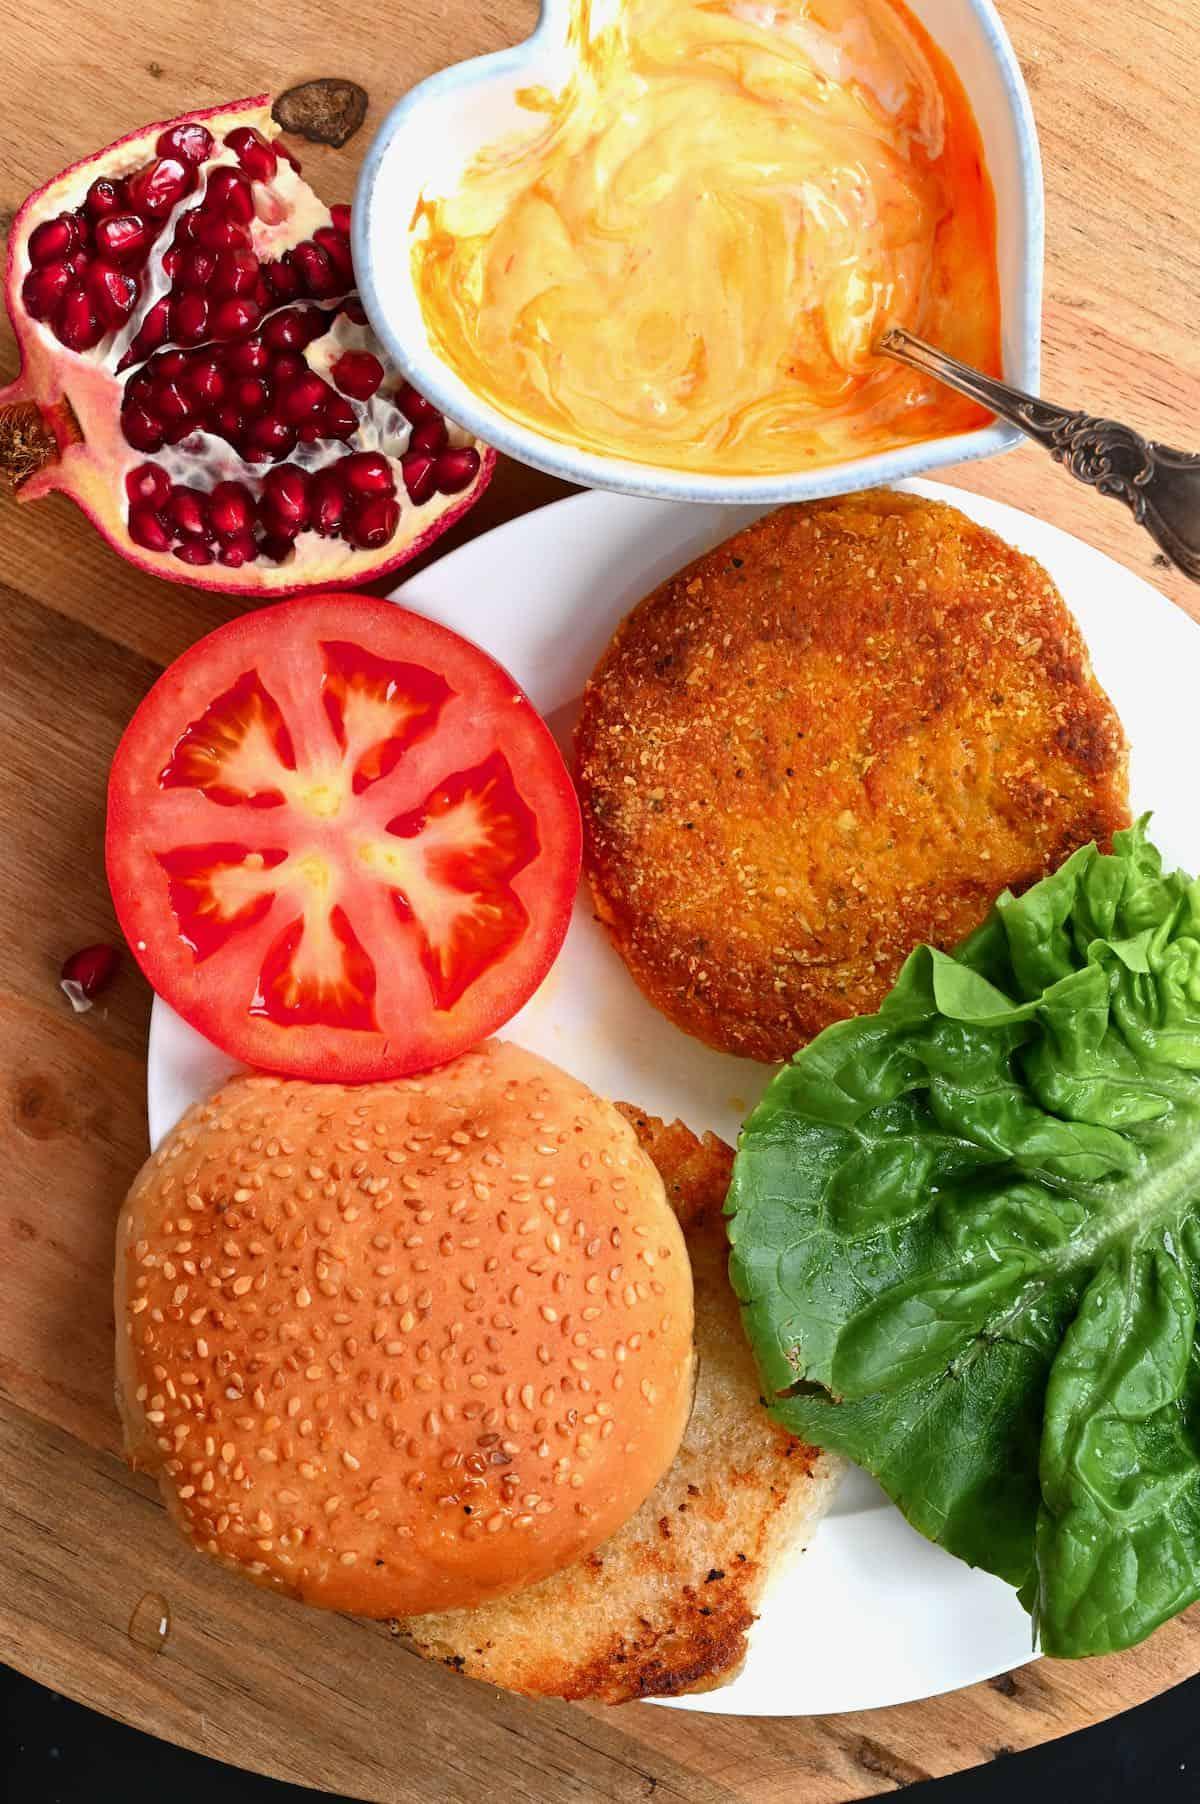 Pumpkin burger toppings